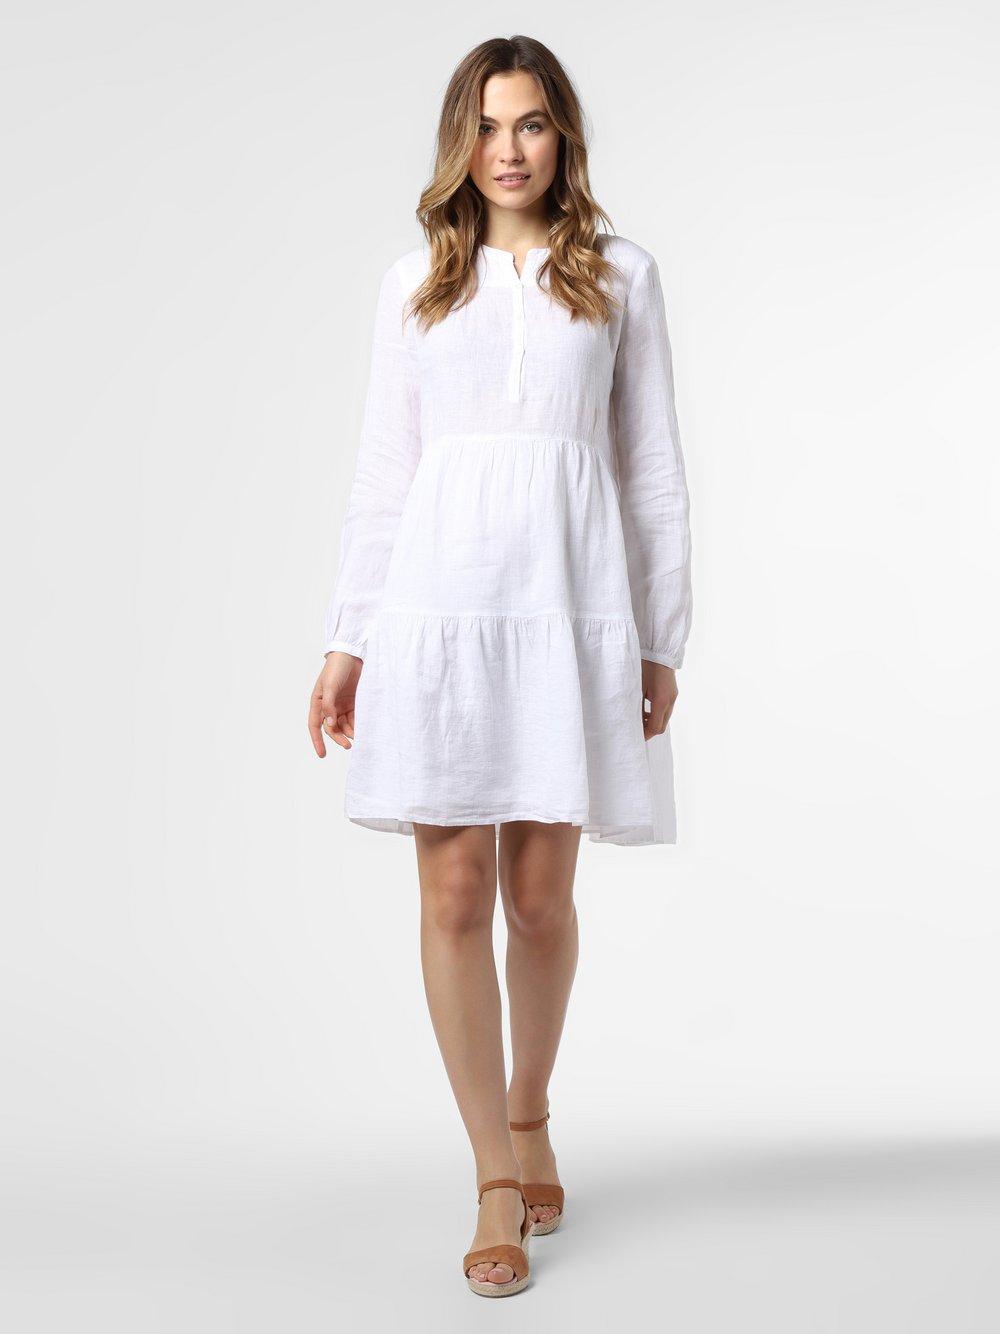 0039 Italy – Damska sukienka lniana – Ricarda New, niebieski Van Graaf 464324-0001-09900